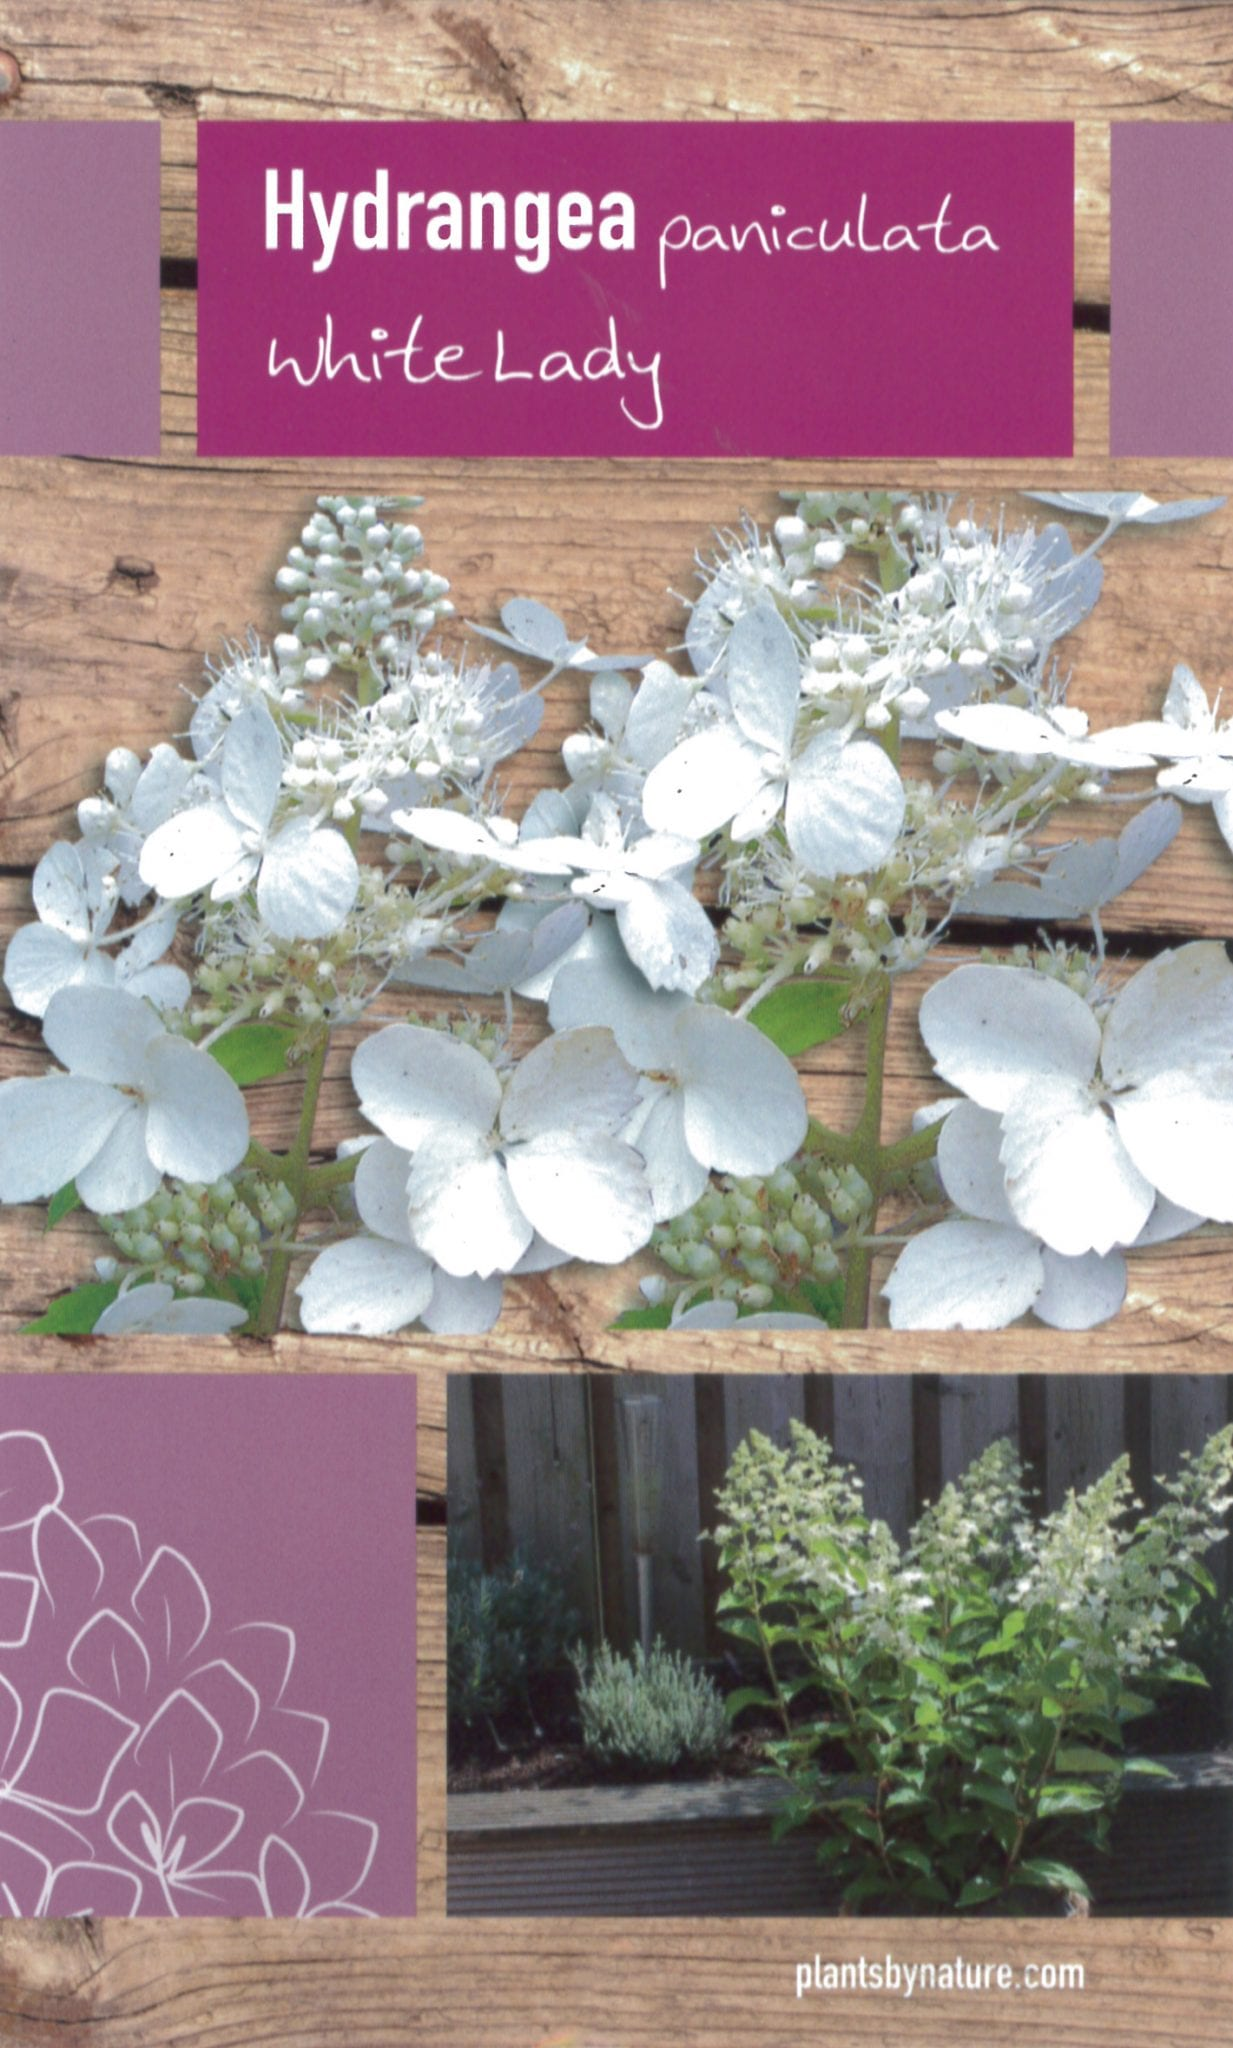 De Hydrangea paniculata 'White Lady' etiket voorzijde | Plants By Nature - gespecialiseerd in hydrangea